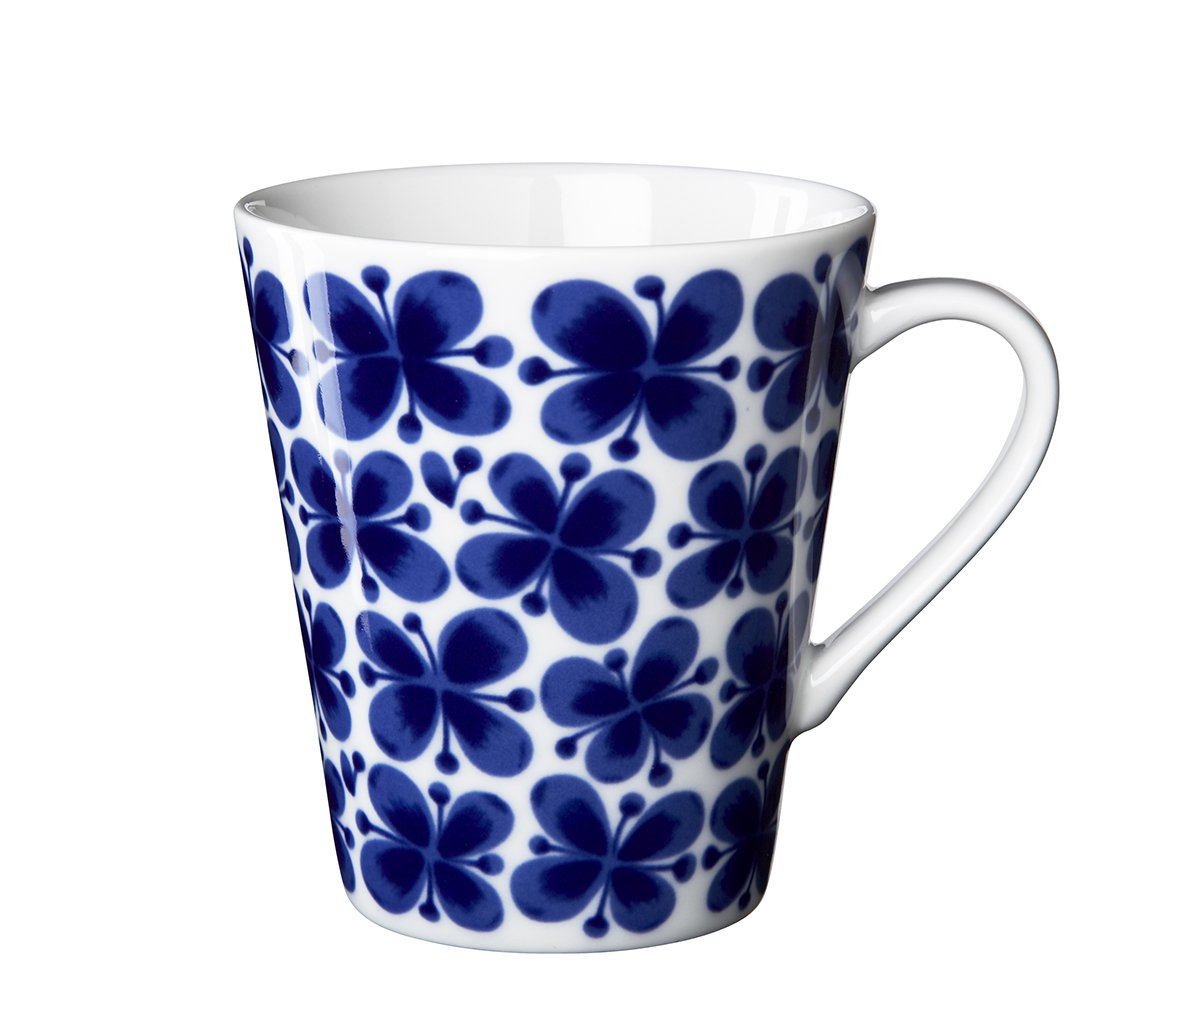 Rörstrand Mon Amie Mug 11.5 Oz